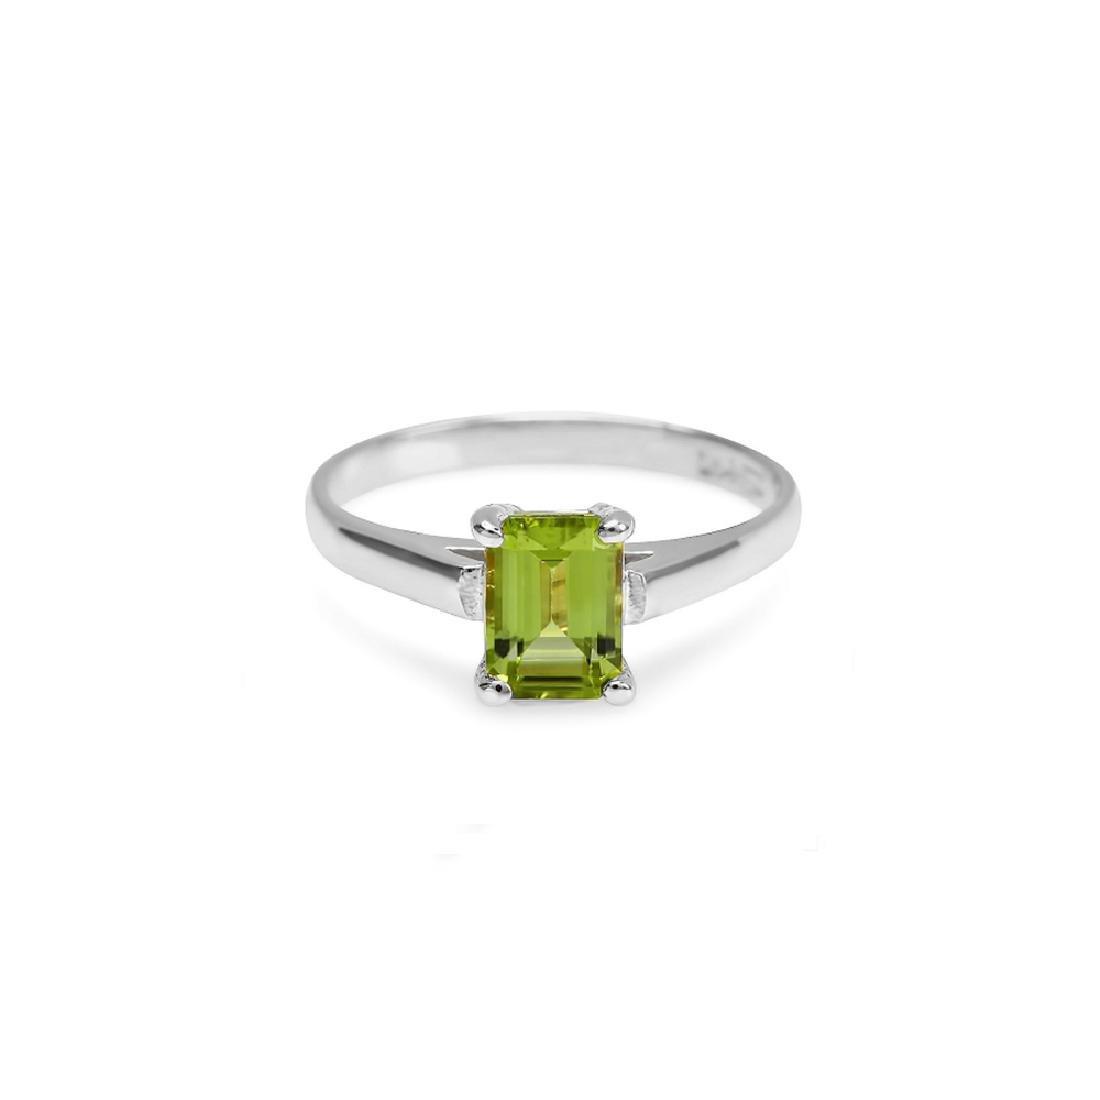 2.00 Carat Natural Peridot 18K Solid White Gold  Ring - 2